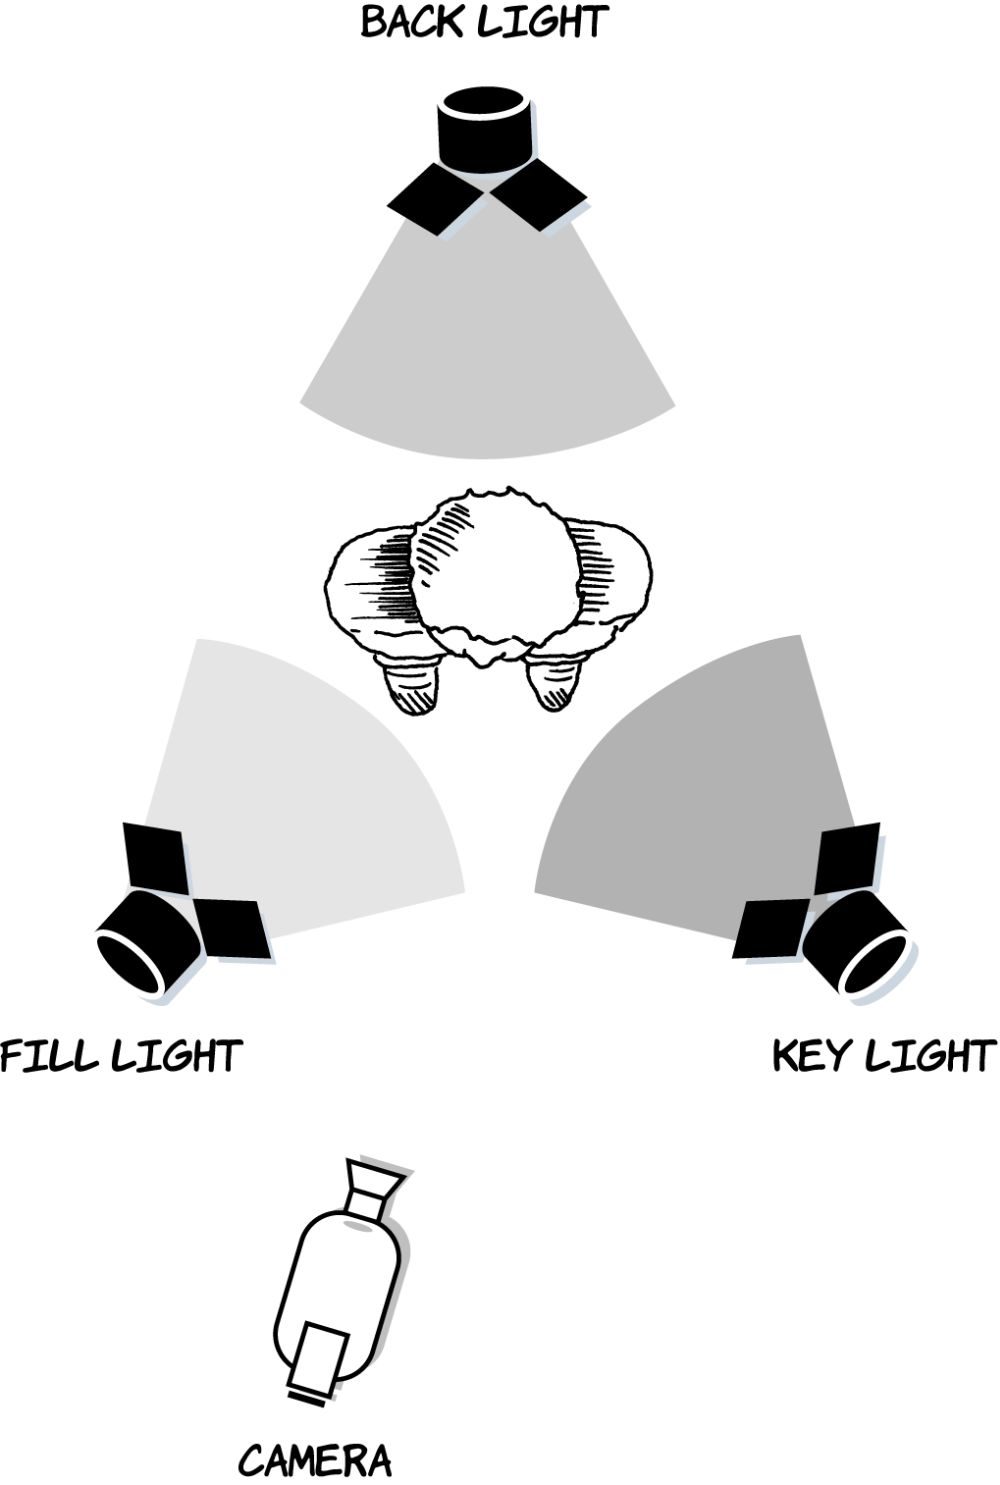 Figure 8.27Three-point lighting: key light, fill light, and back light.